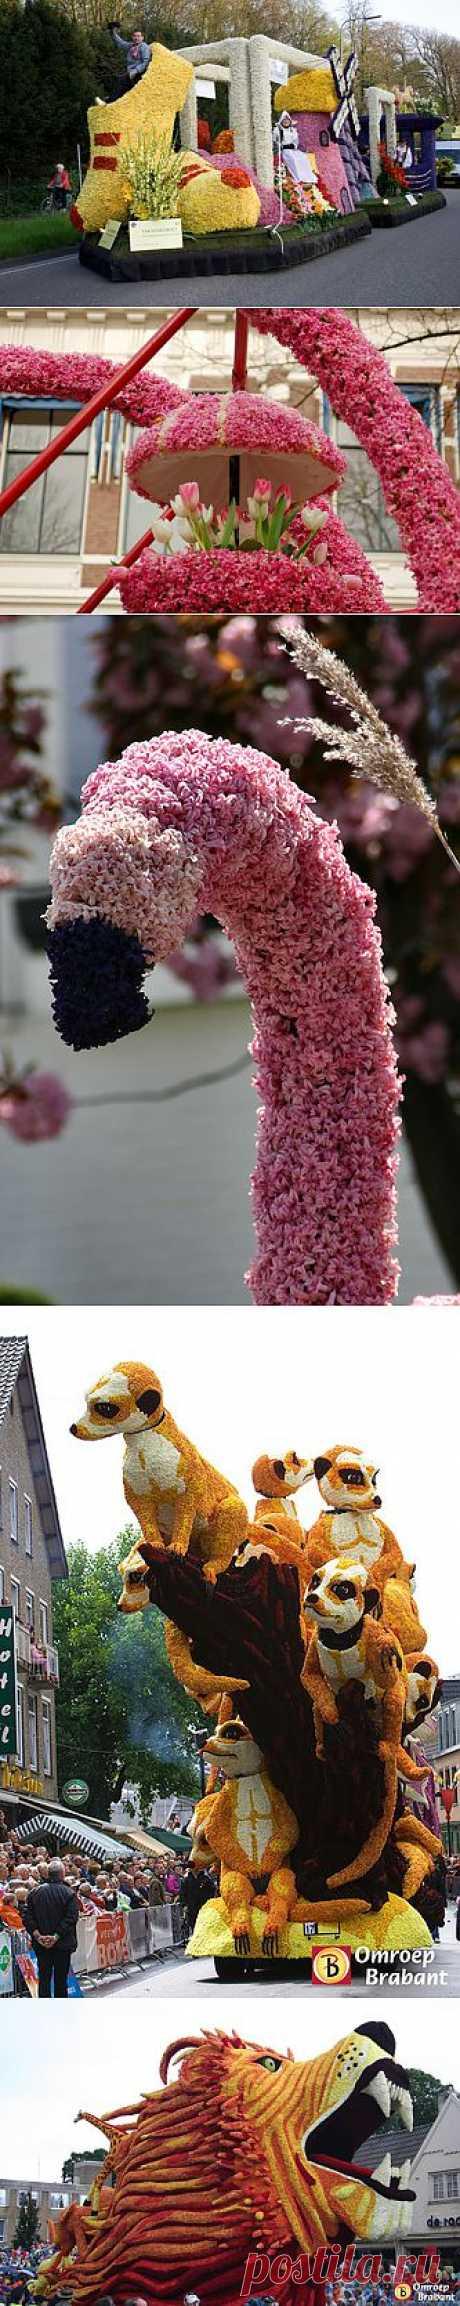 Путешественники.ru - Aalsmeer Flower Parade